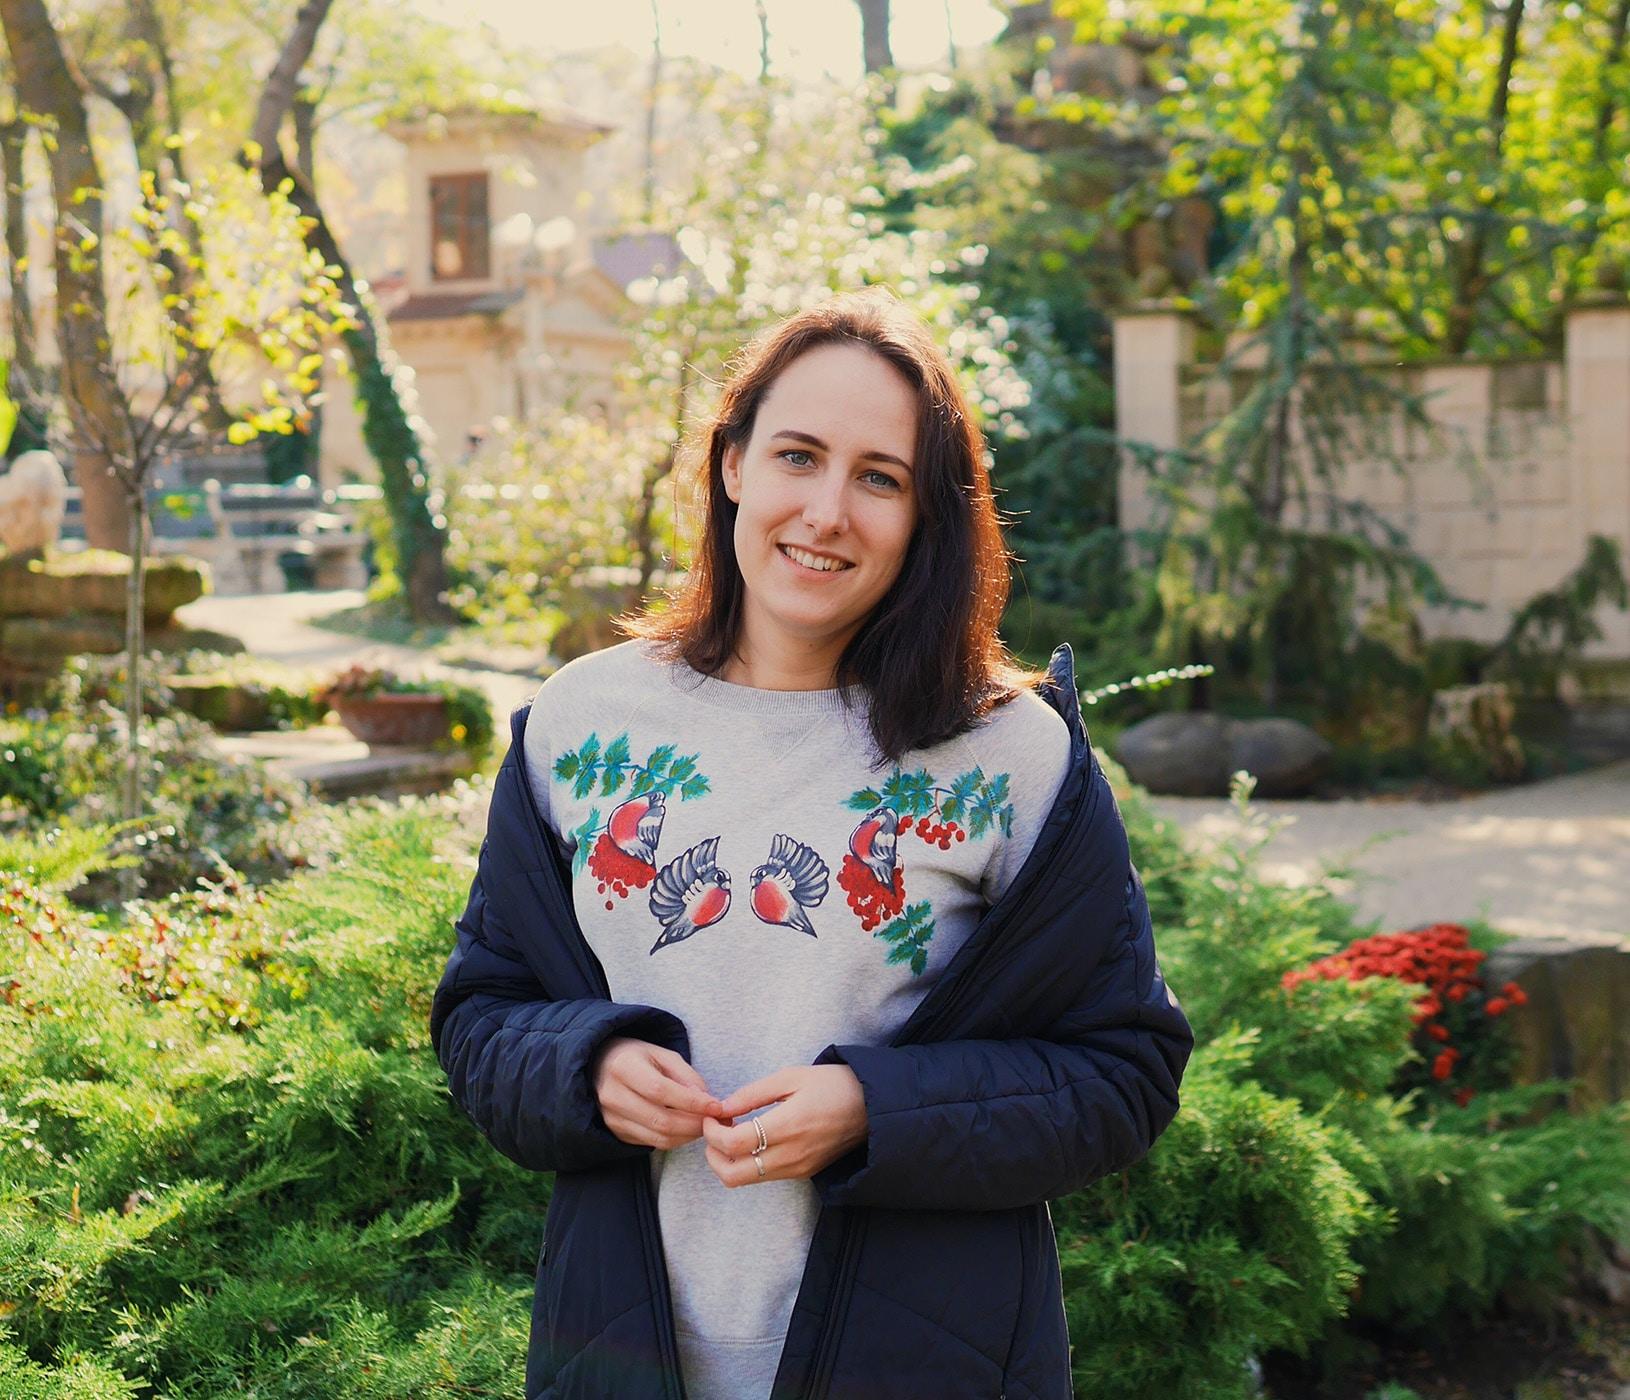 Go to Ana Ovsyannikova's profile